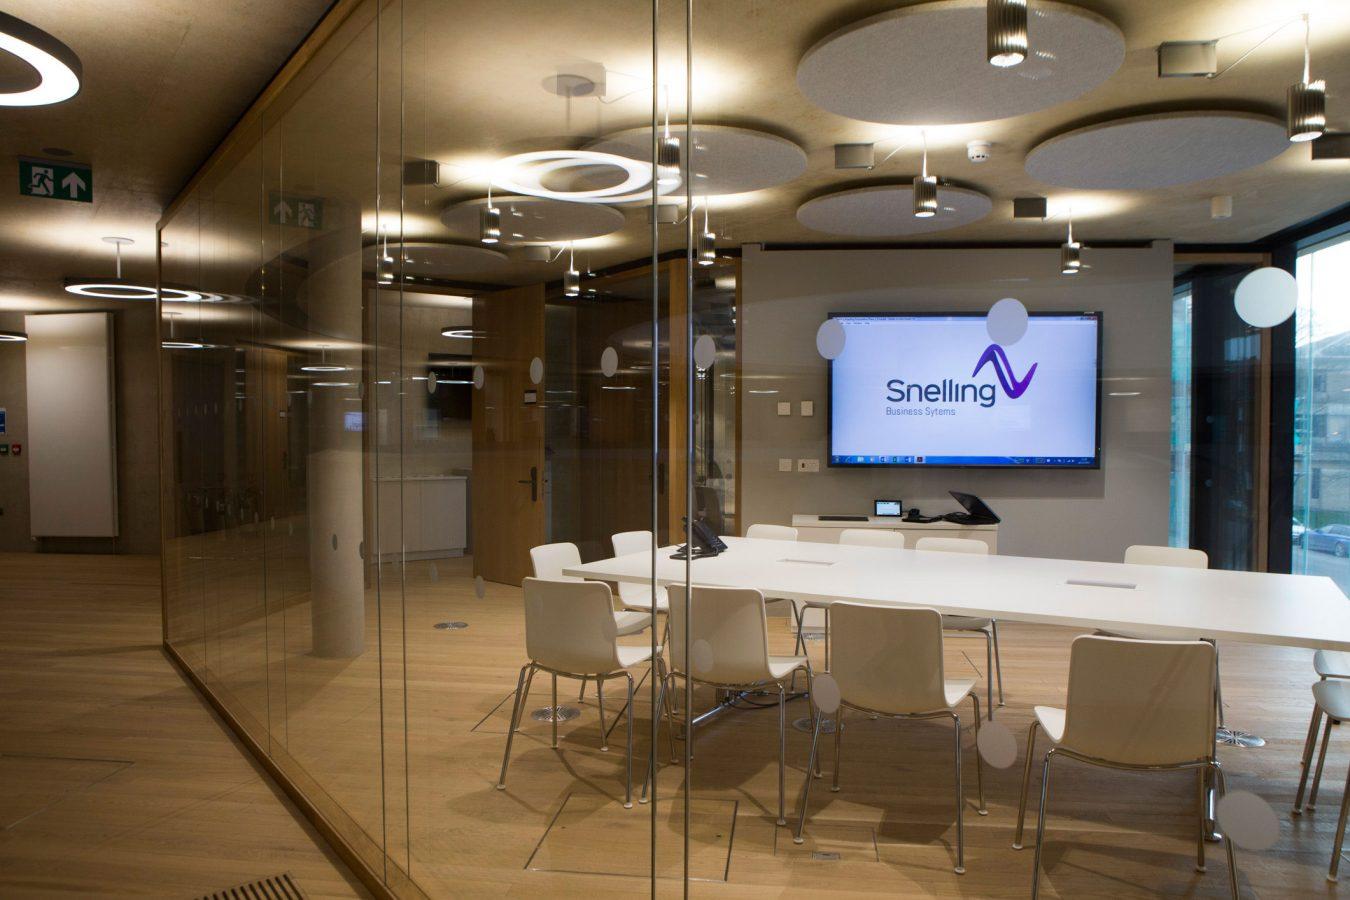 Blavatnik | Snelling Business Systems 13